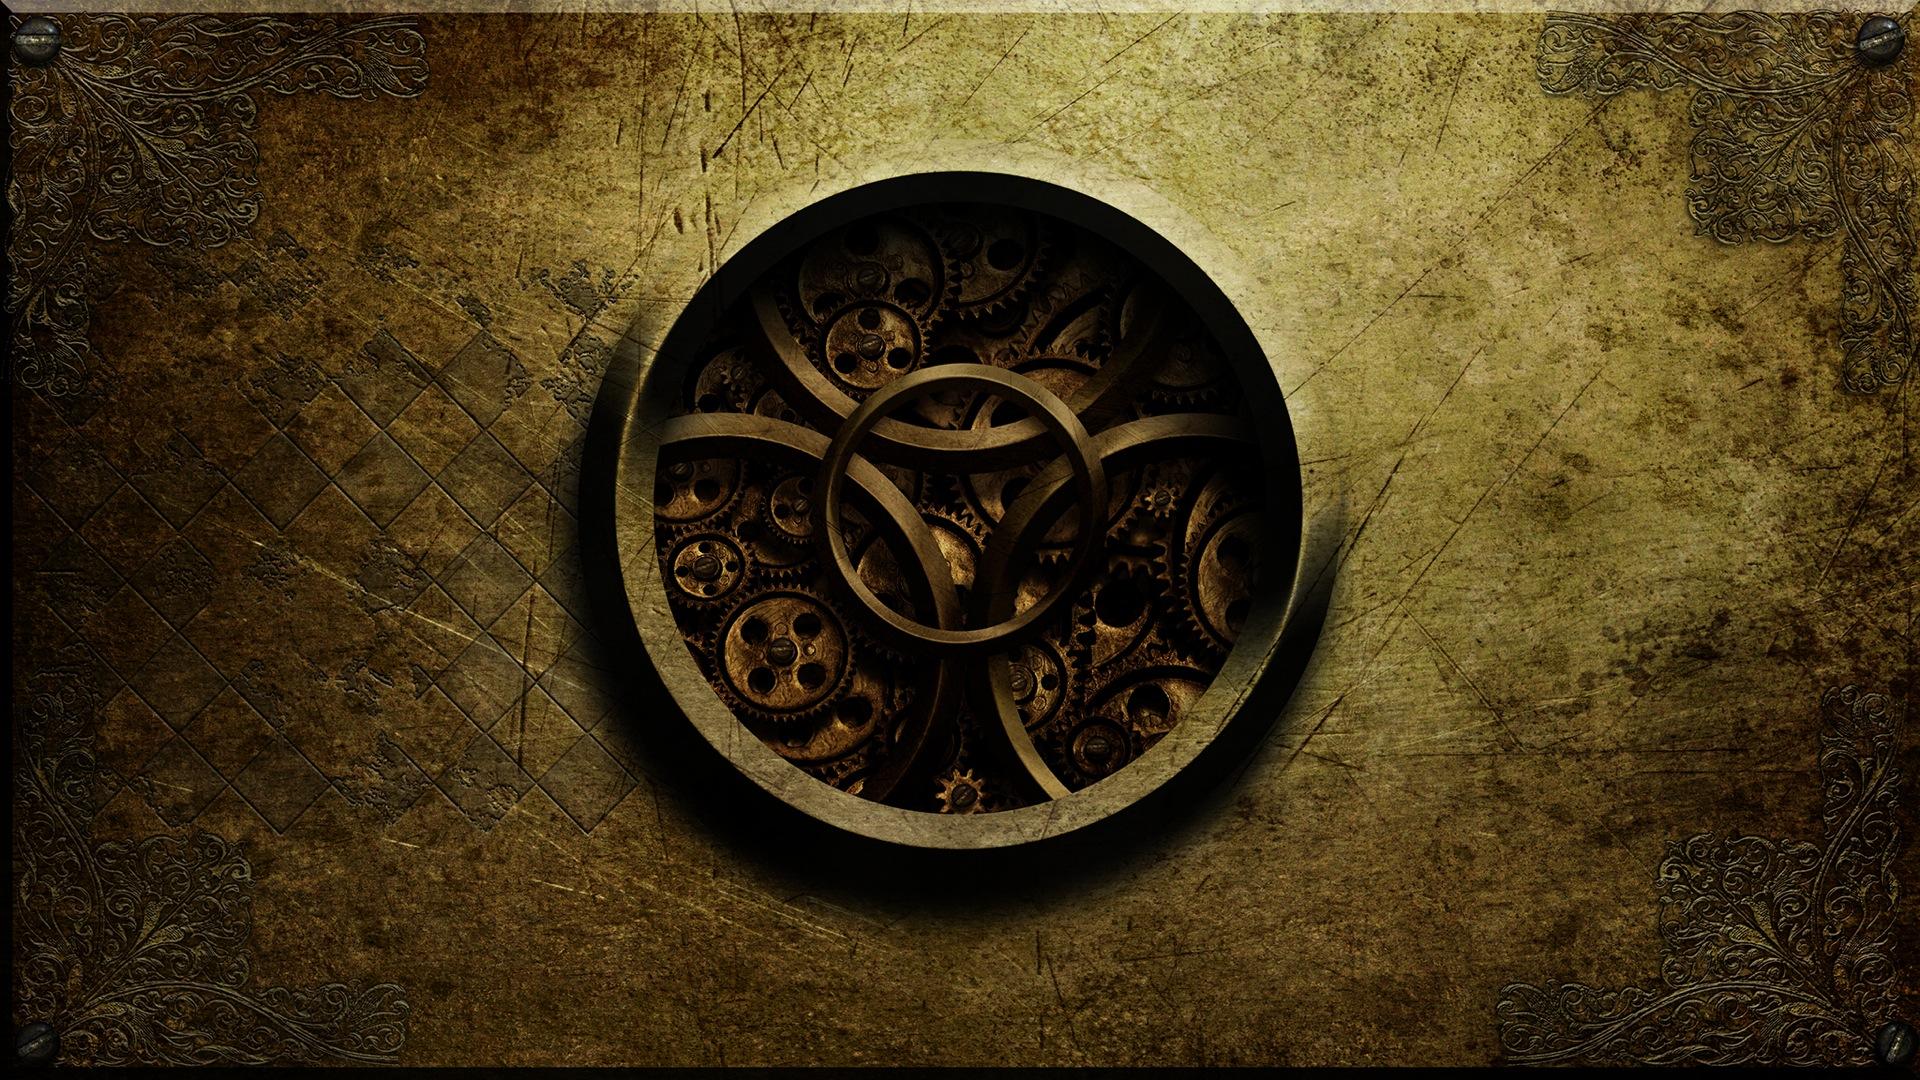 Artwork Gears Steampunk